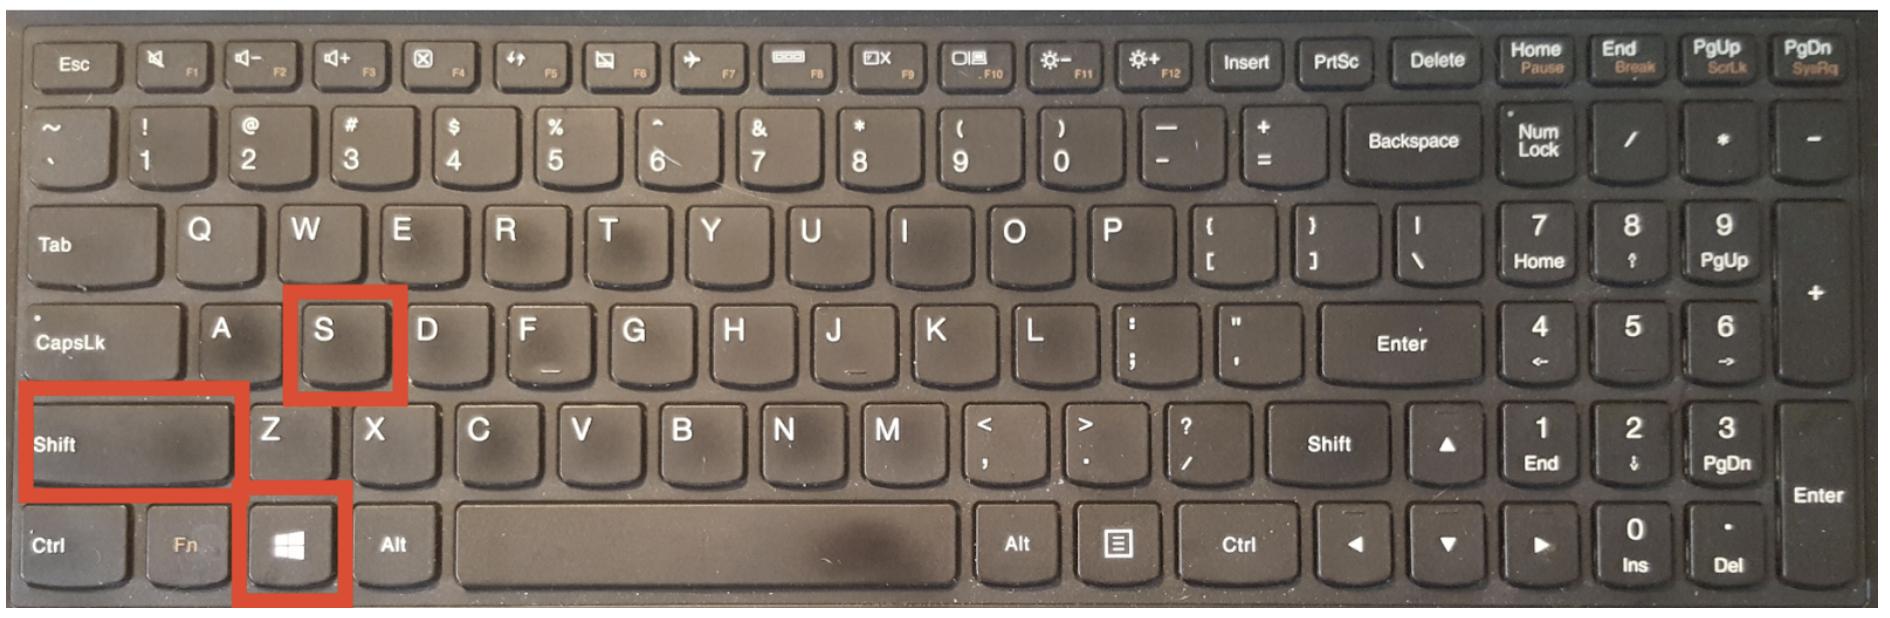 how-to-take-a-screenshot-in-windows